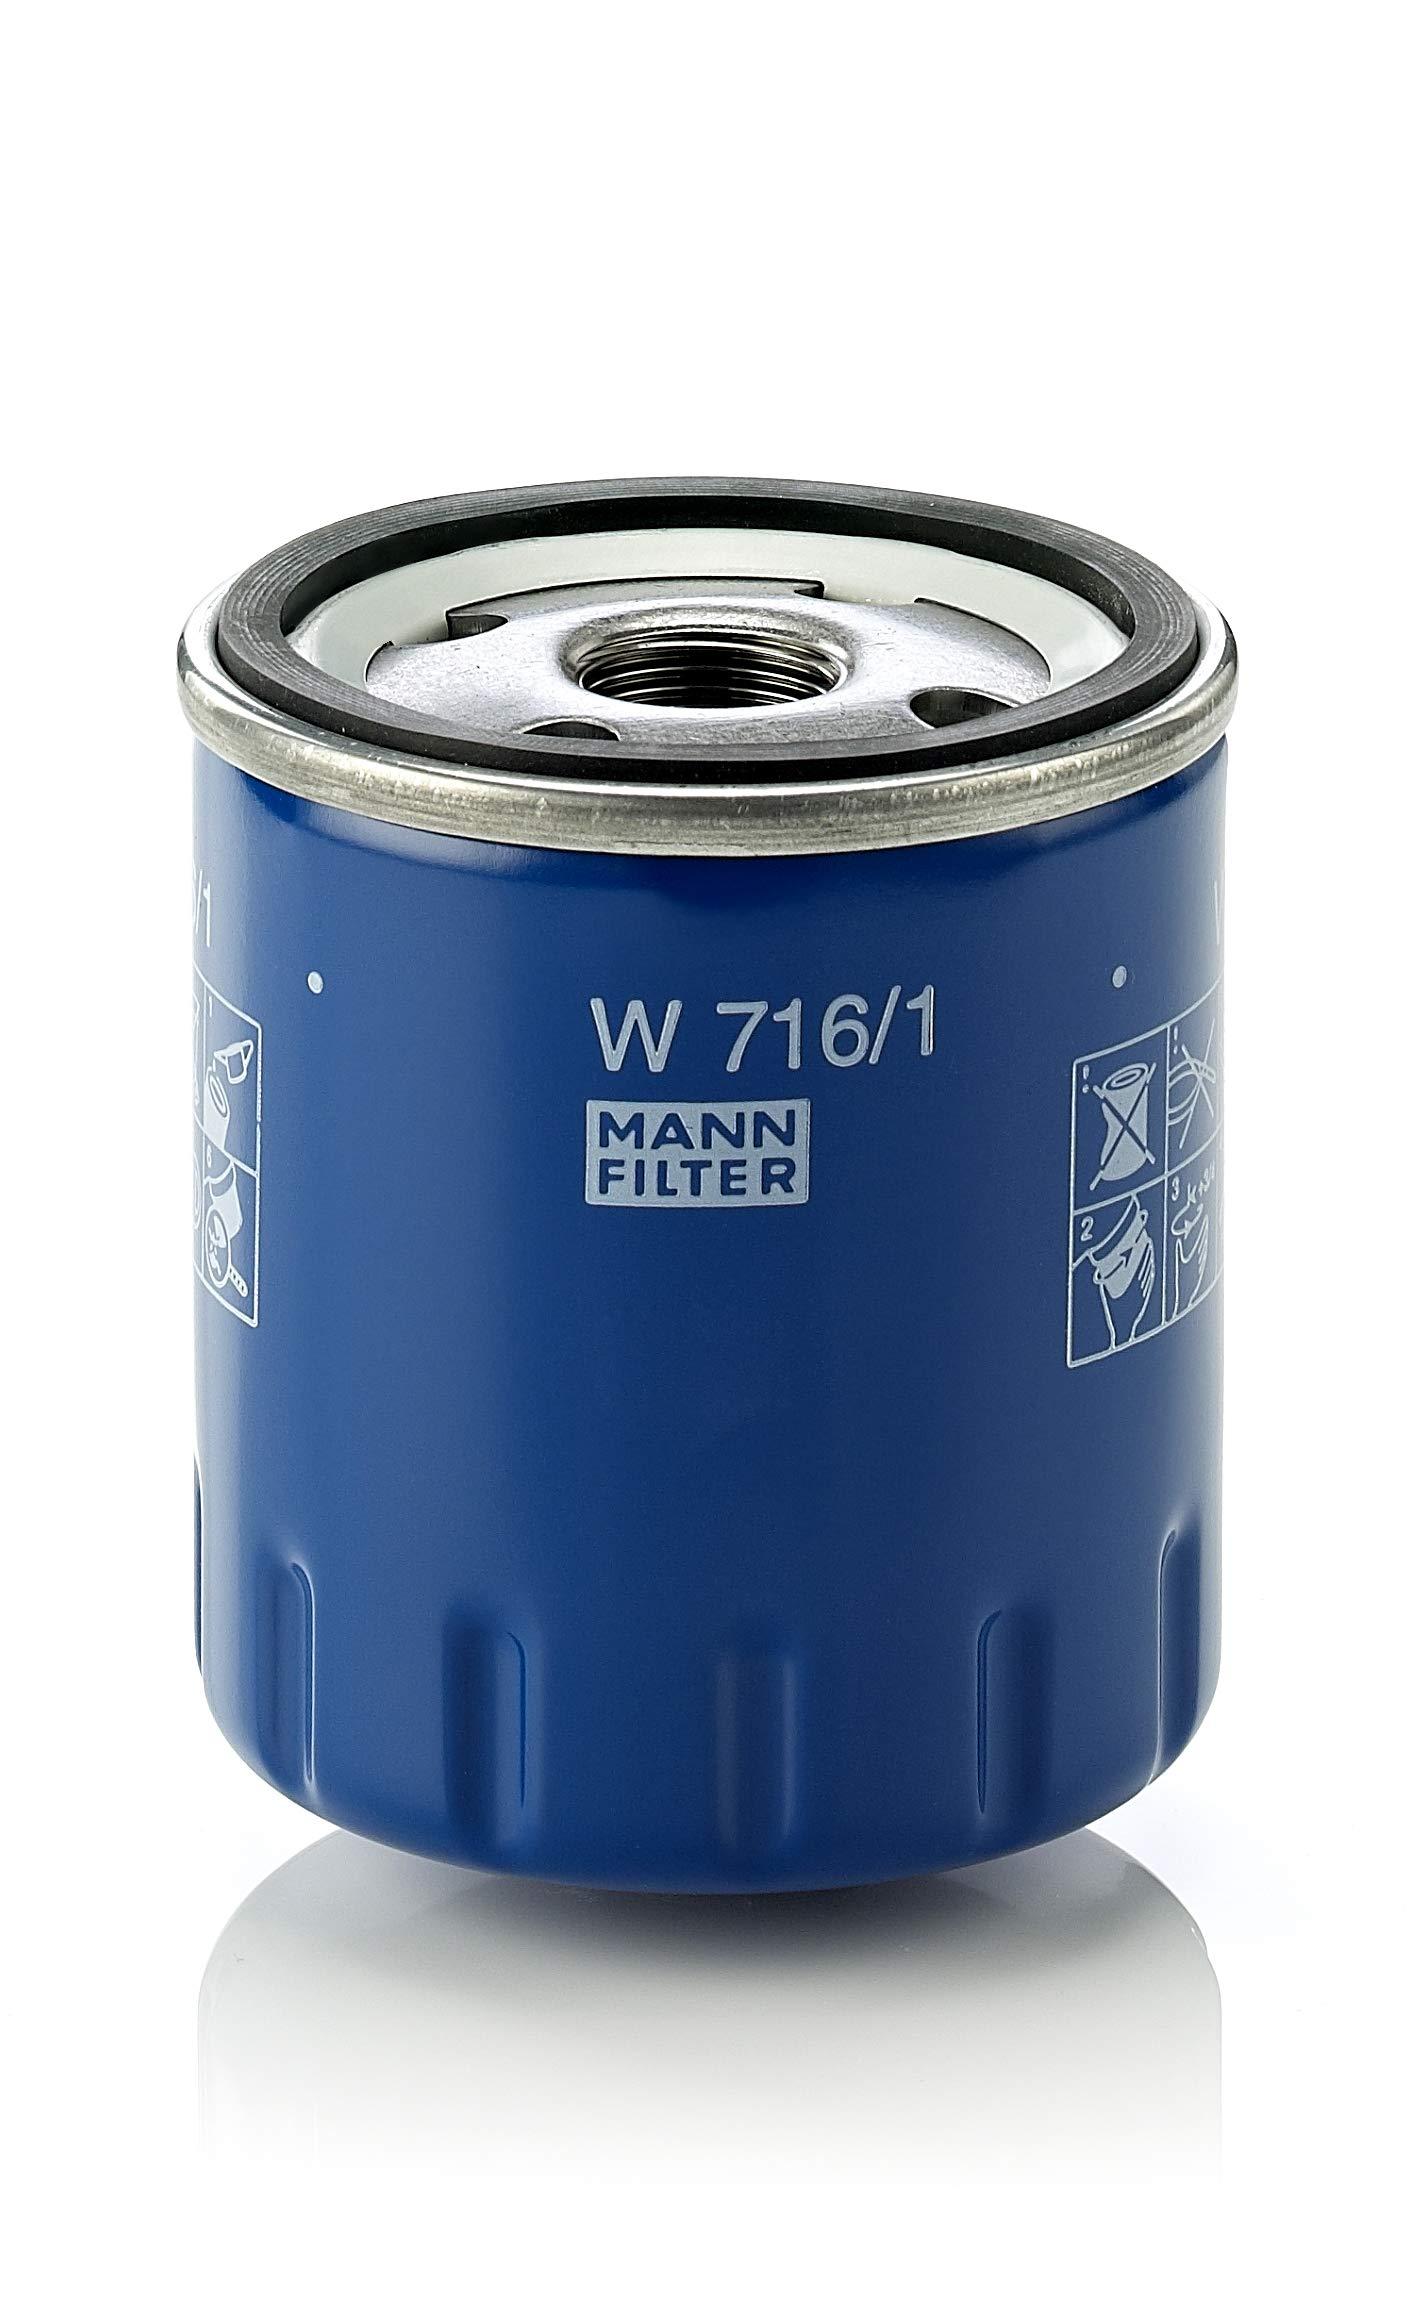 MANN-FILTER Original Filtro de Aceite W 716/1 – Para automóviles product image